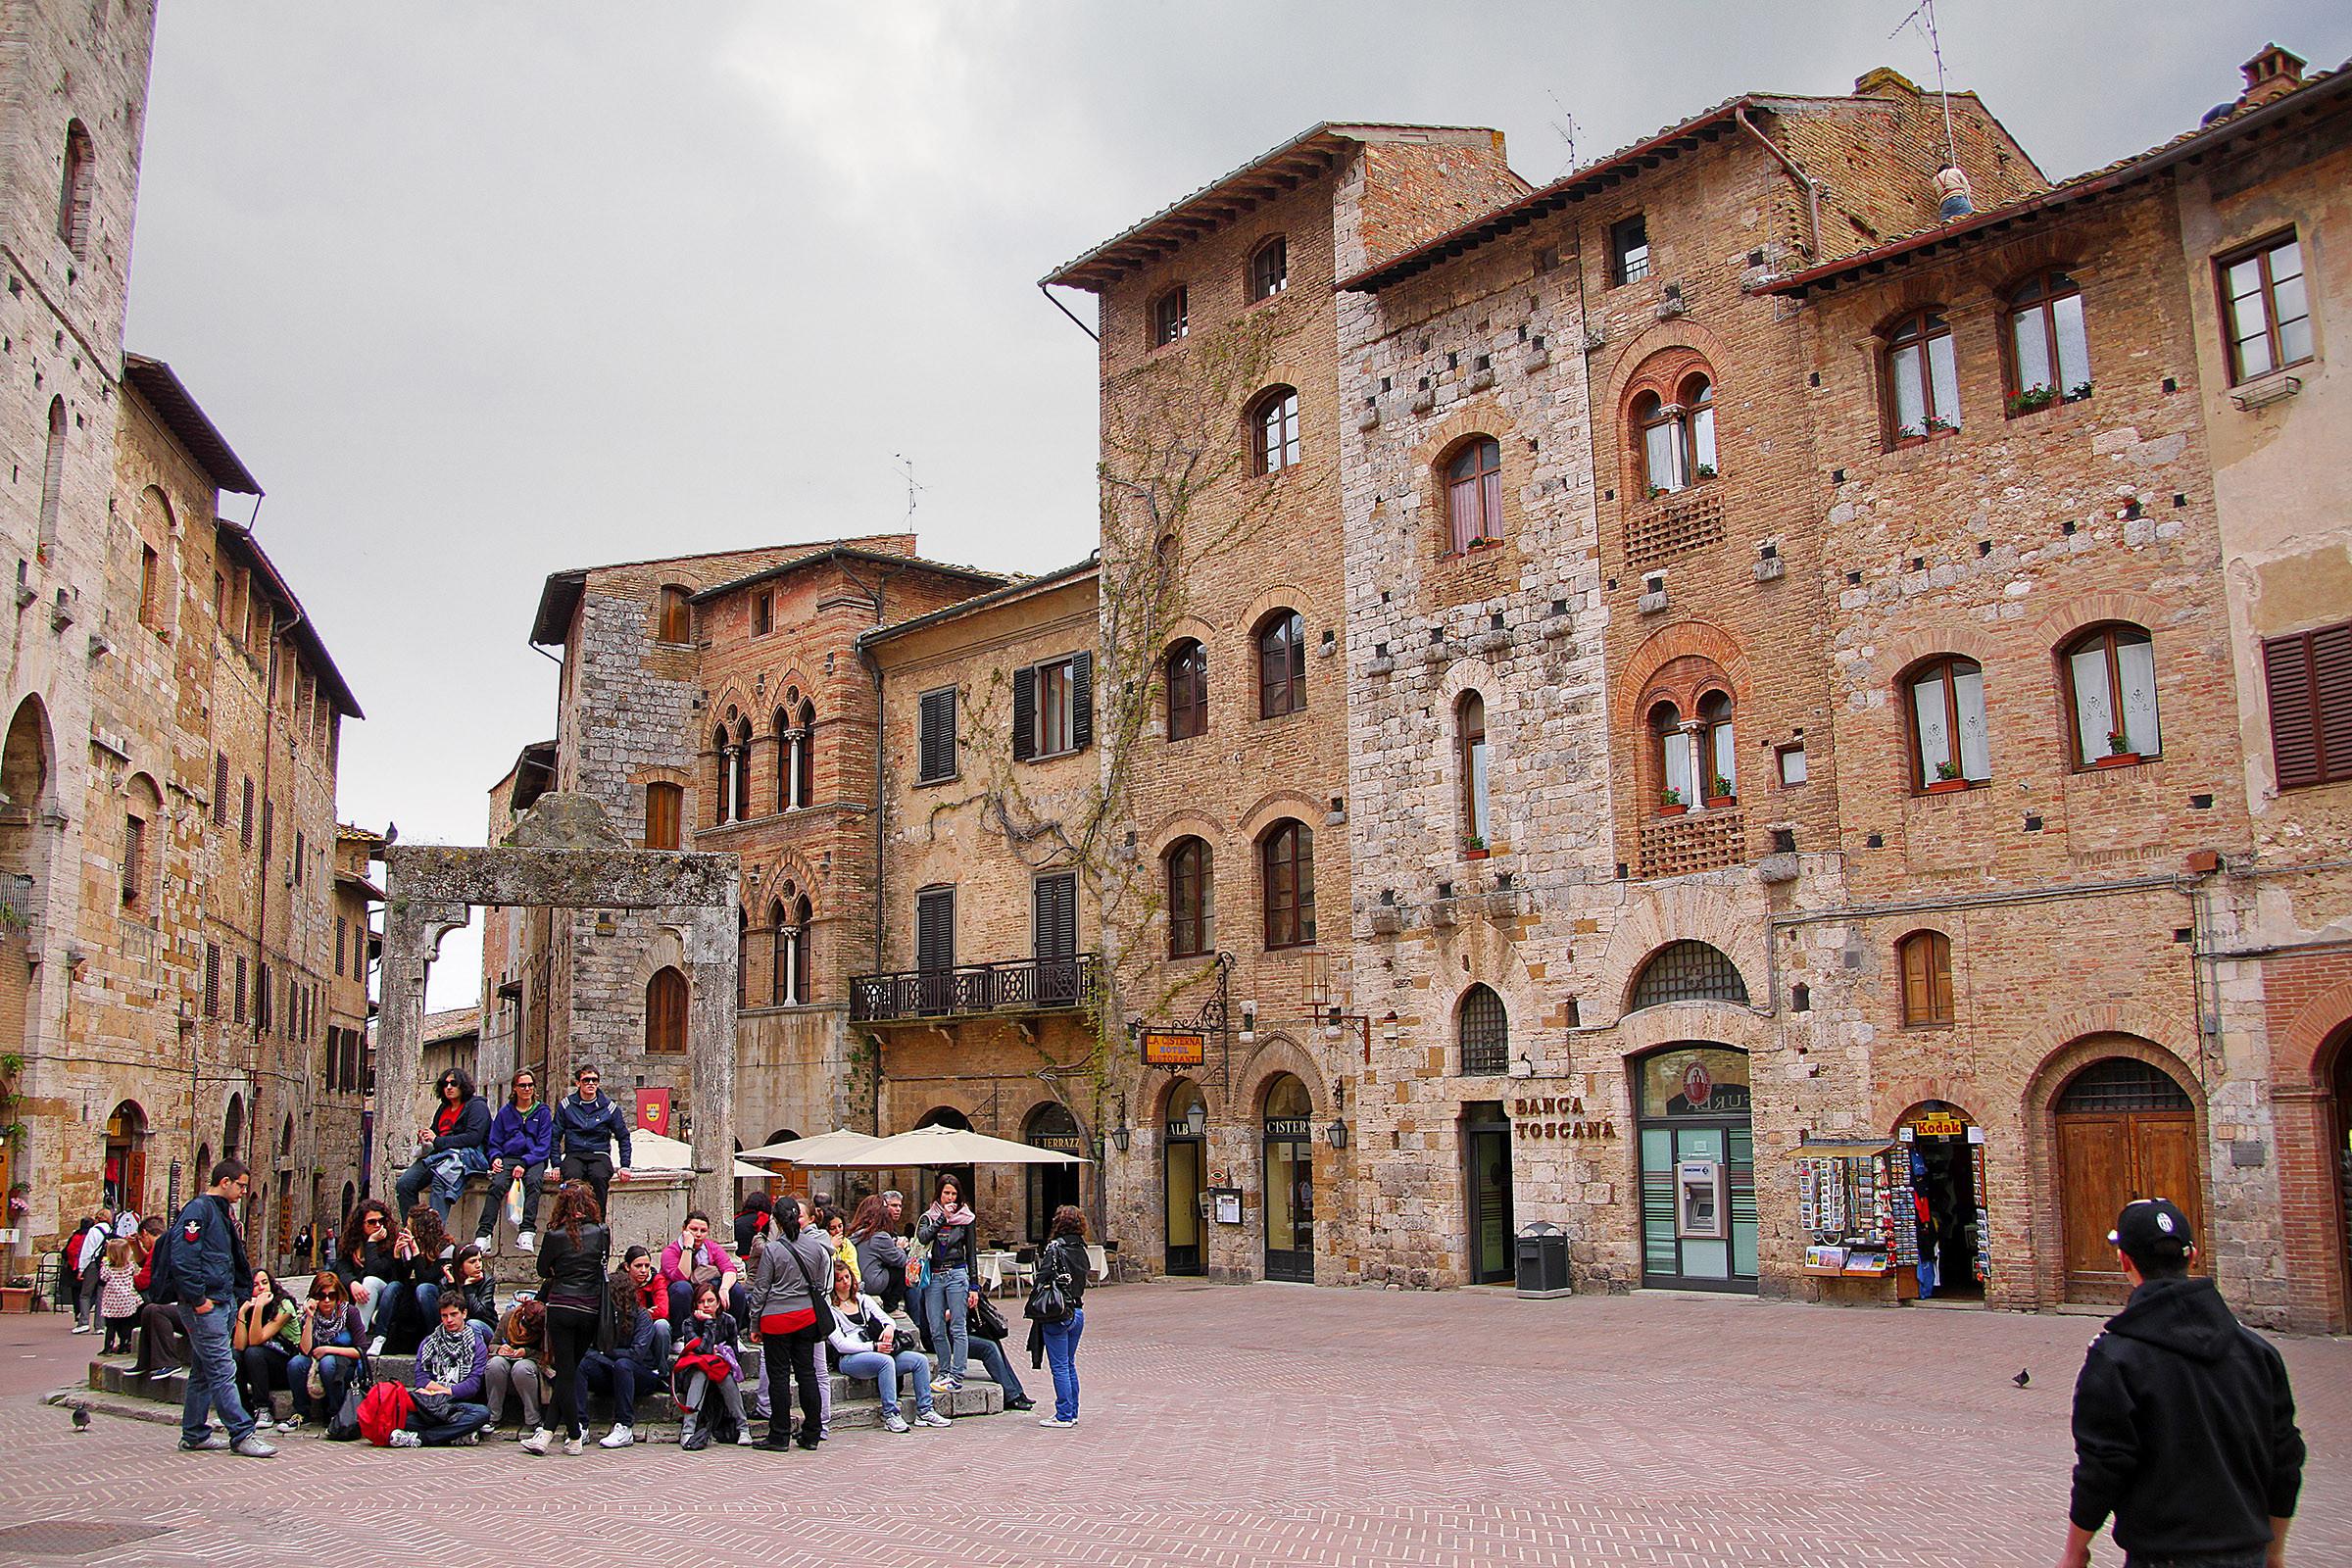 The main piazza of San Gimignano